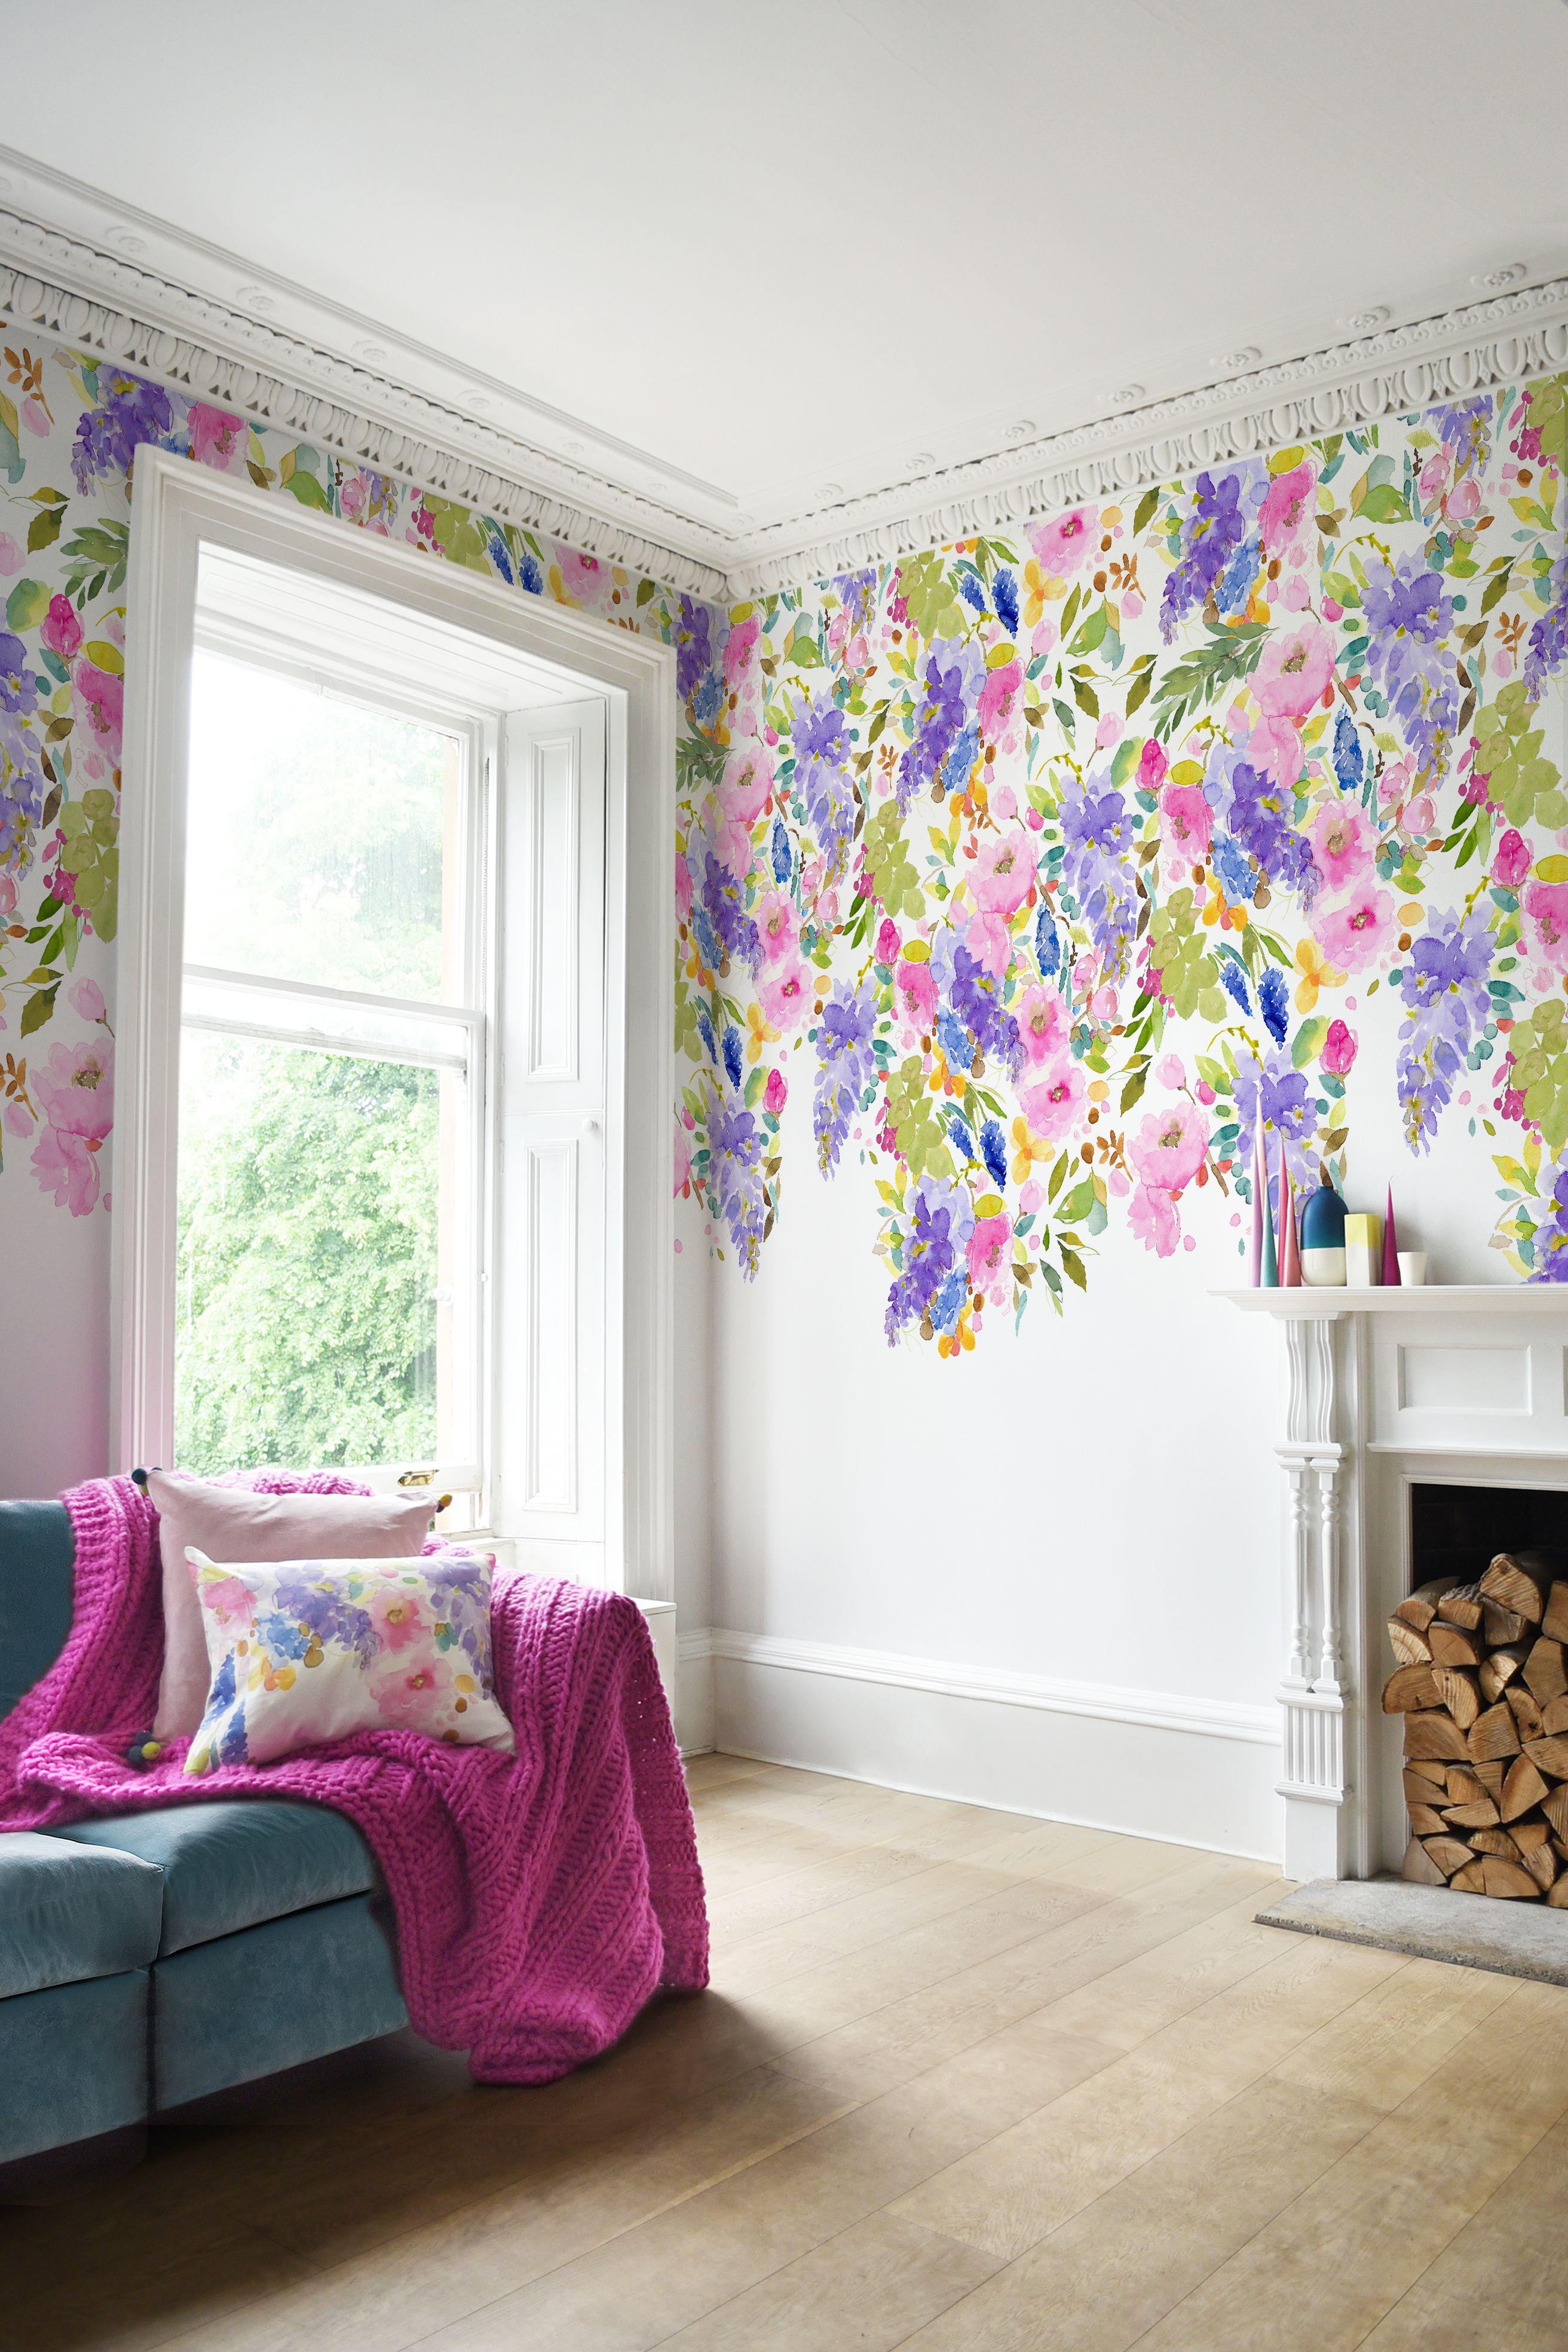 Wisteria Garden Mural Wallpaper By Bluebellgray